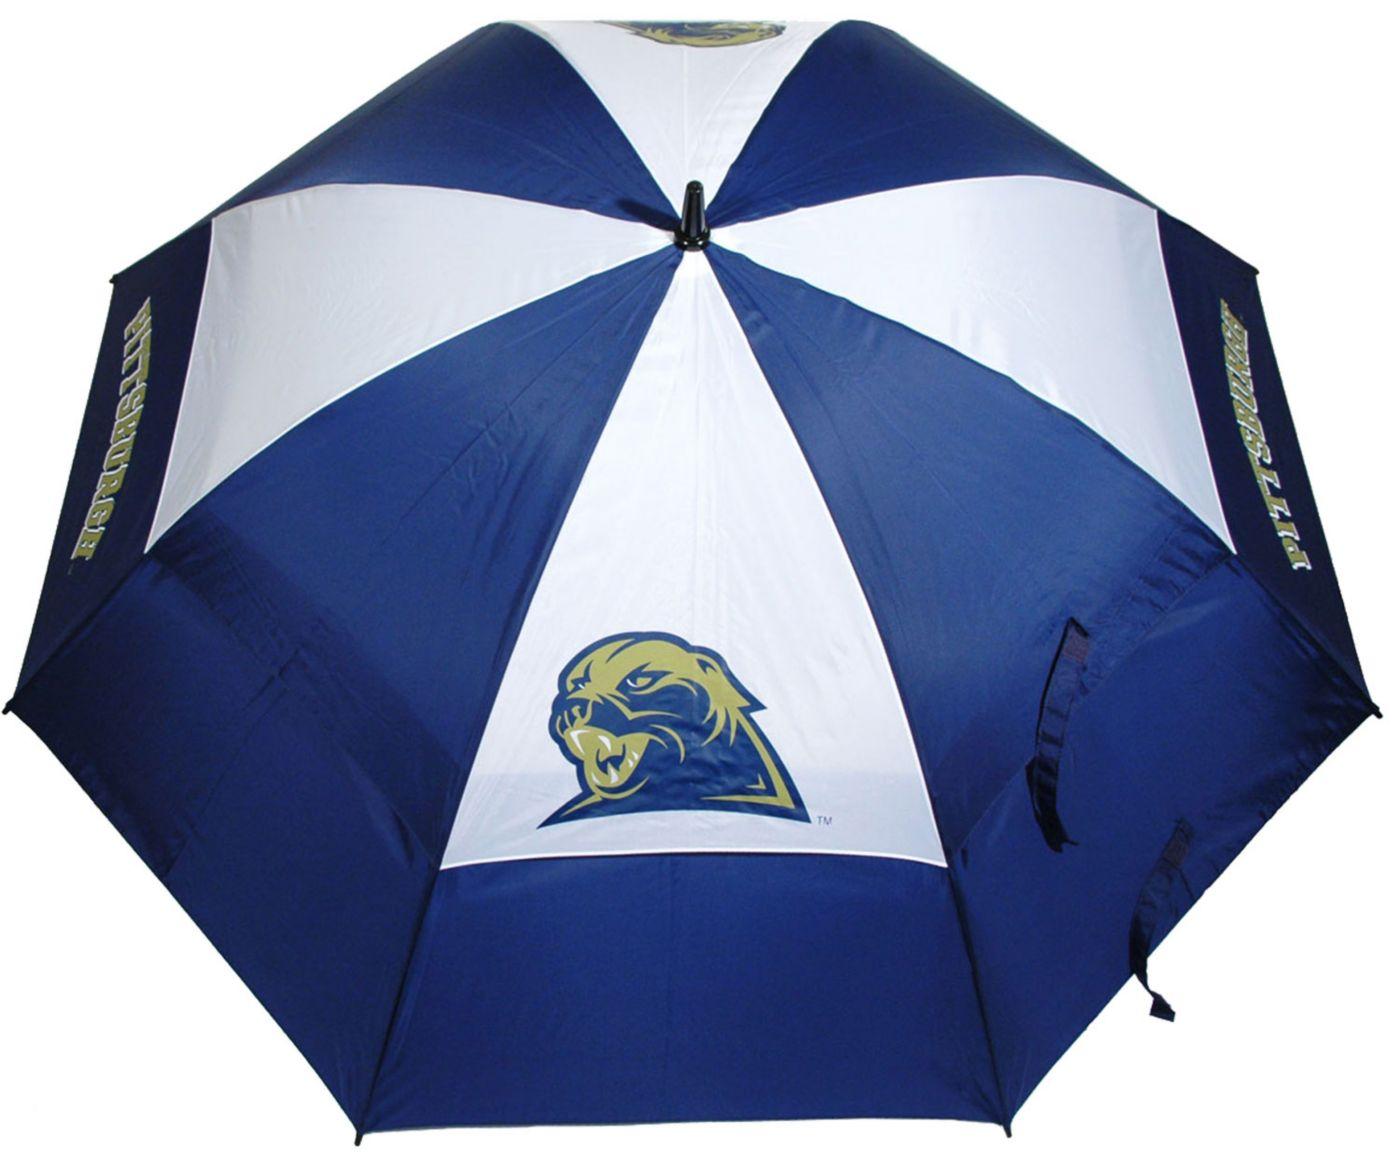 Team Golf Pitt Panthers Umbrella